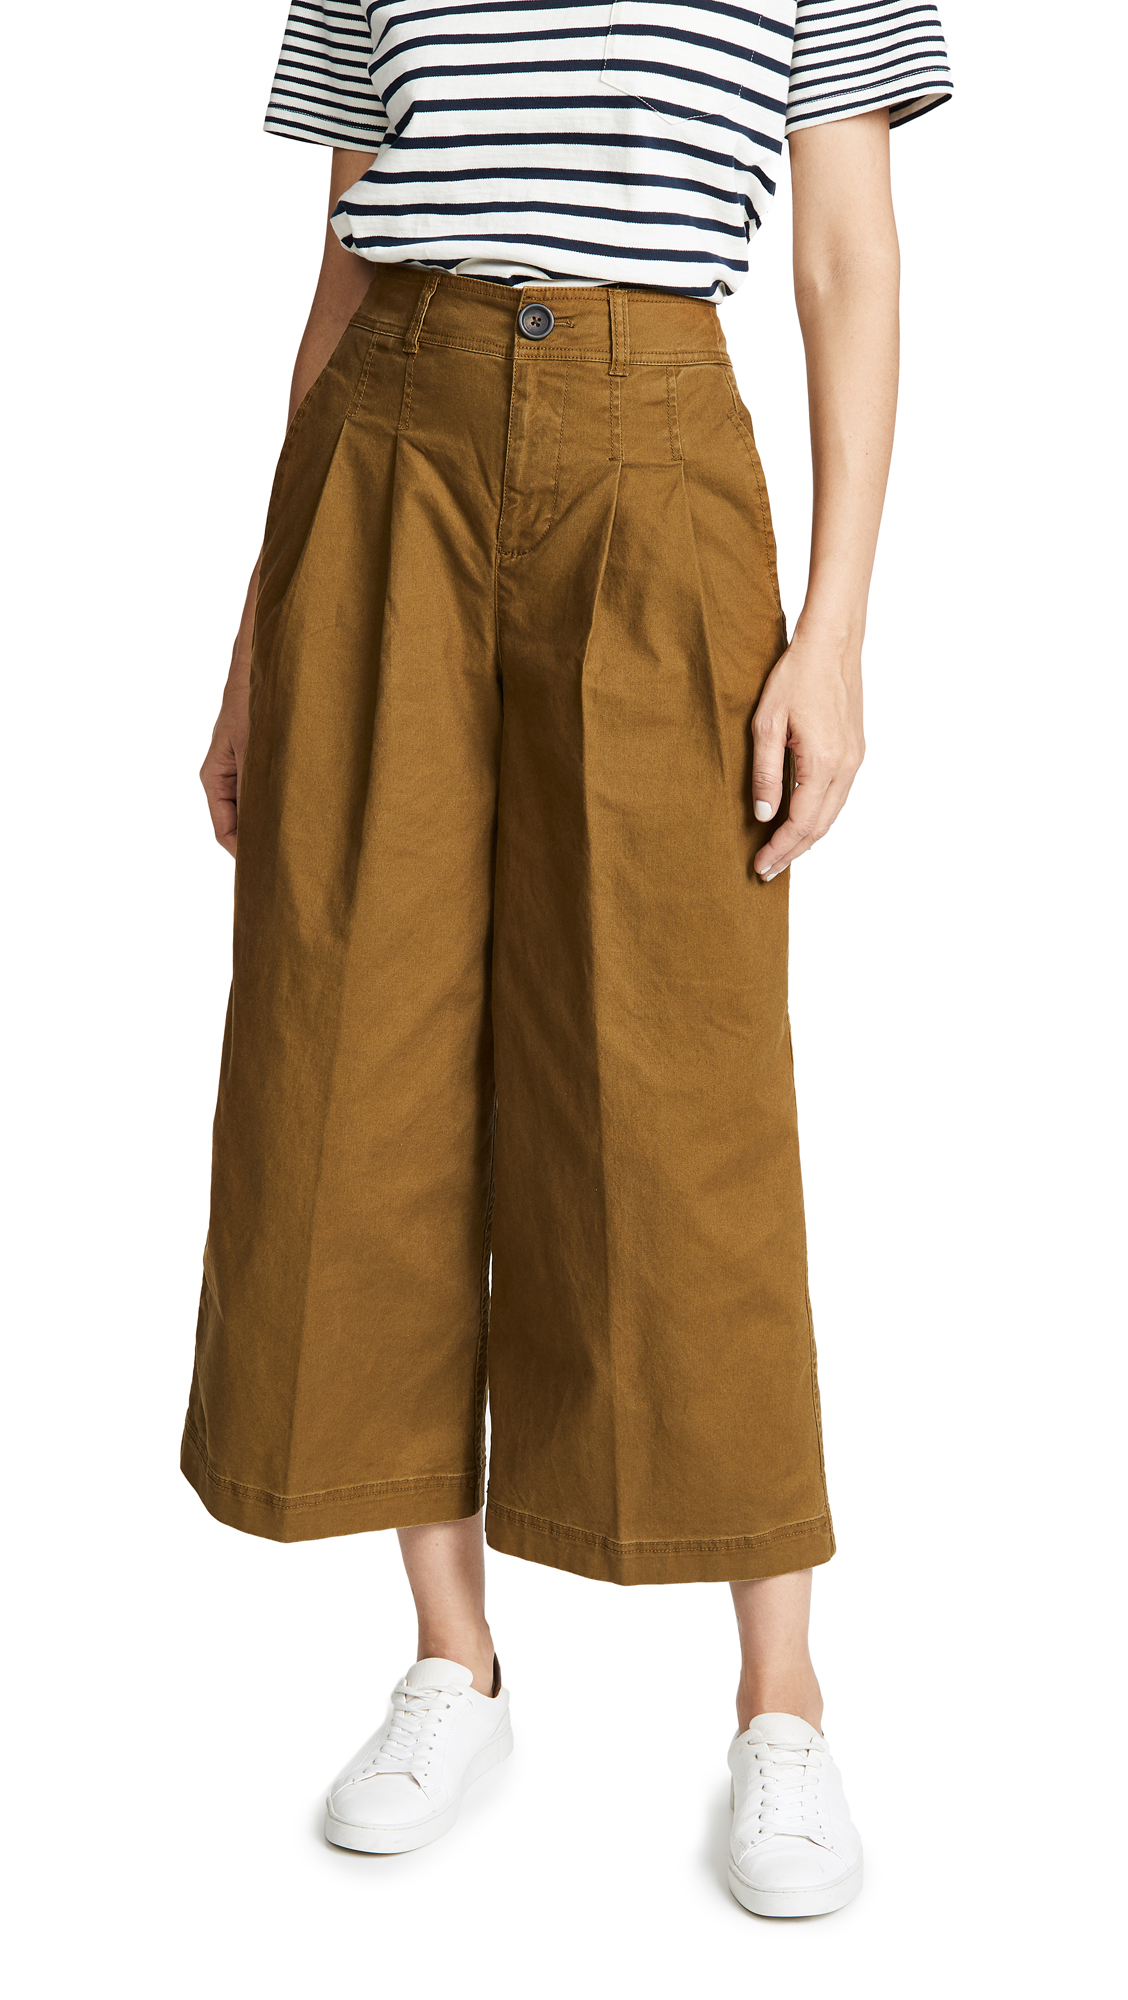 Madewell Pleated Wide Leg Pants - Weathered Olive